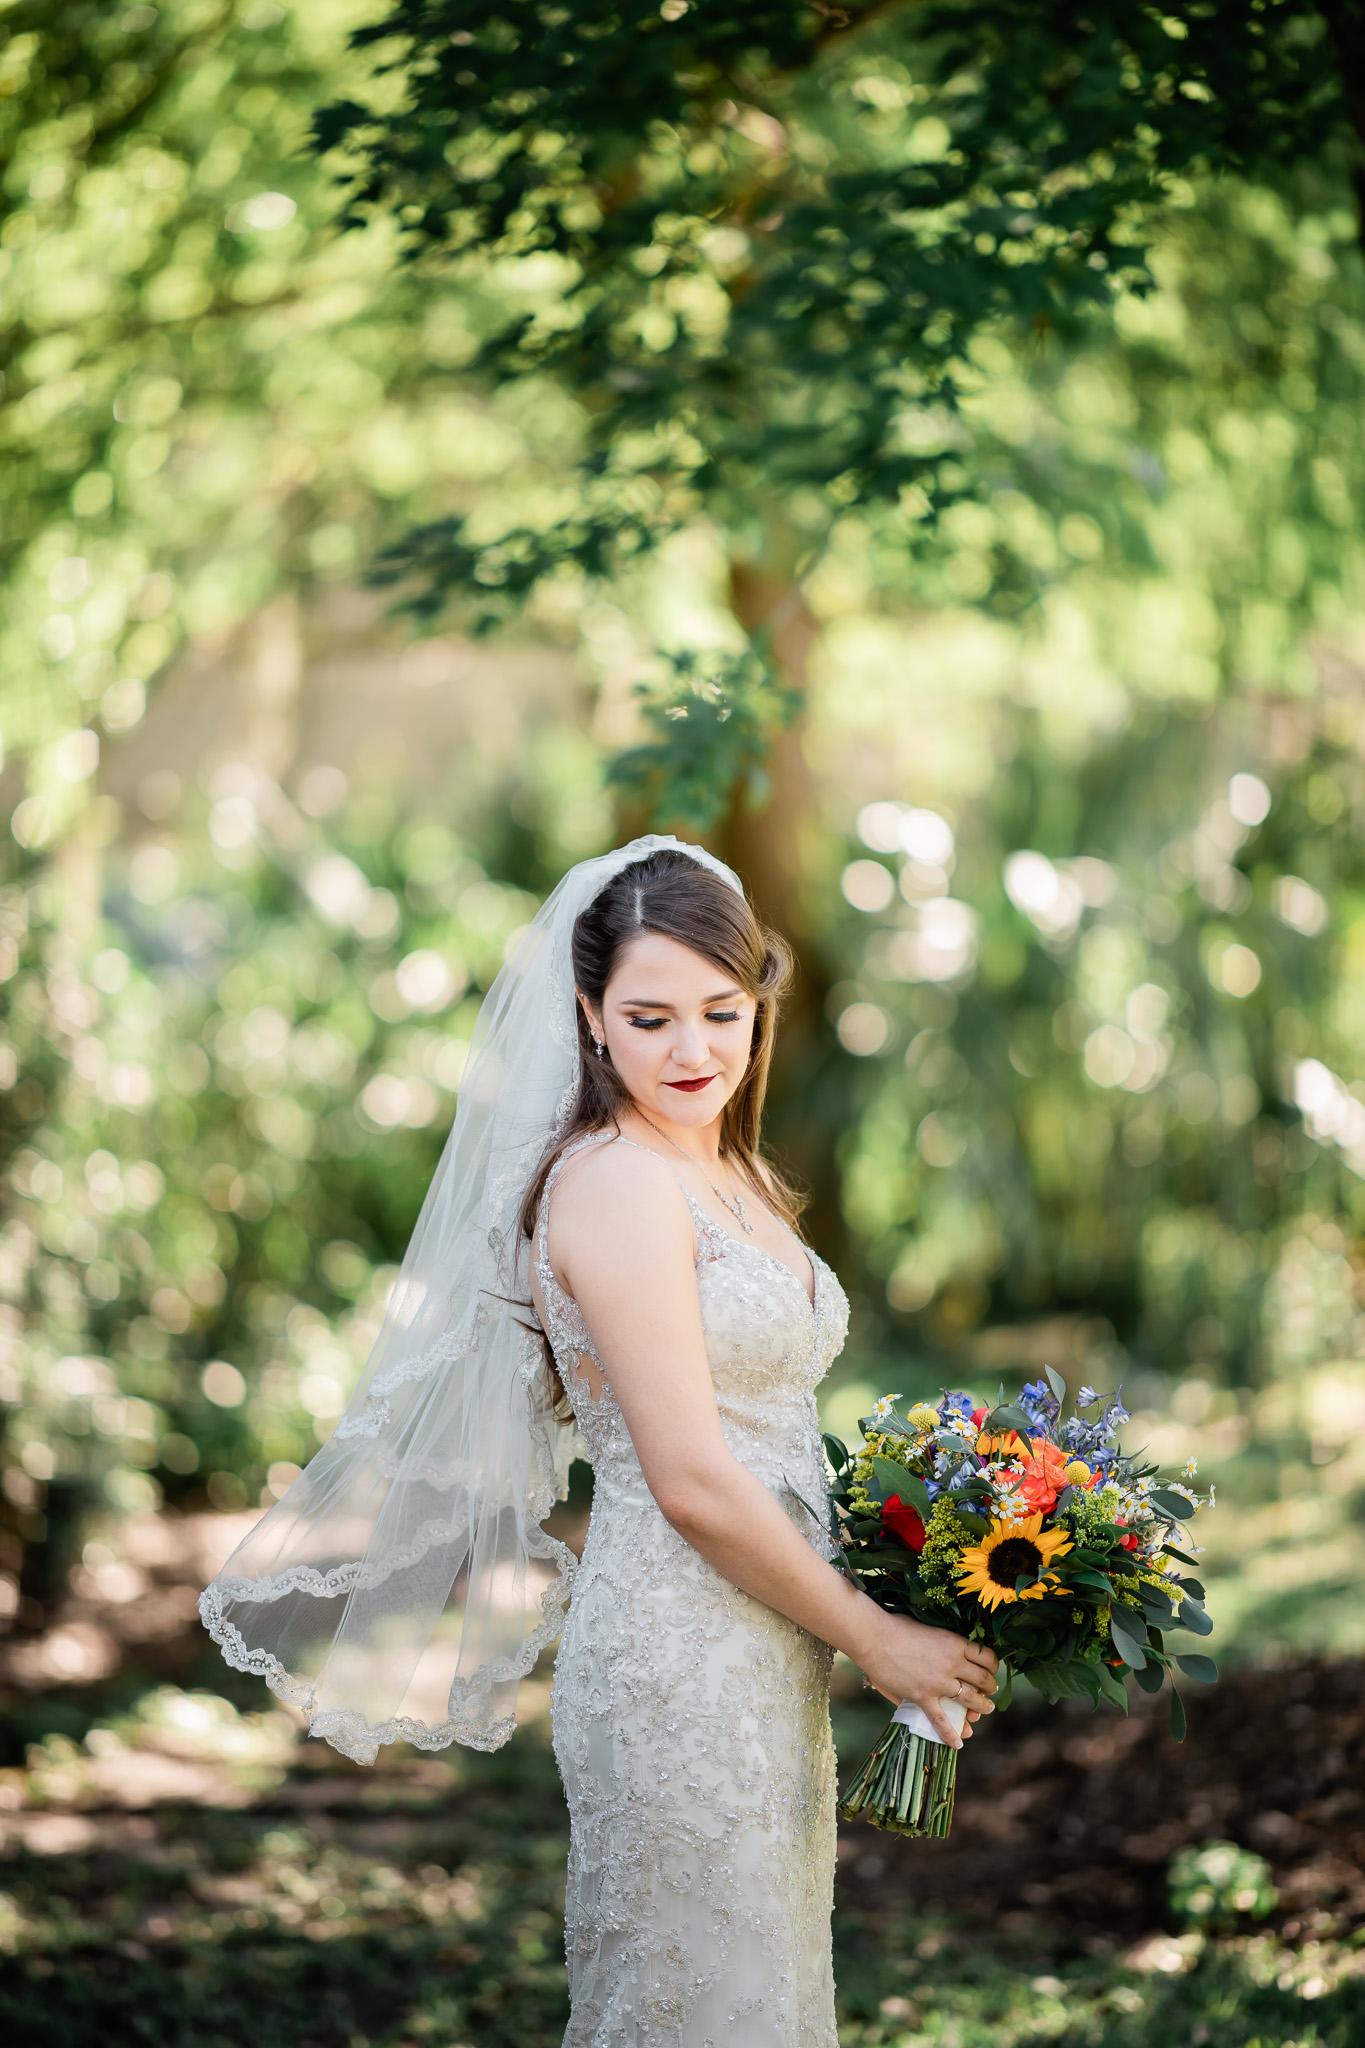 TAMPA_WEDDING_PHOTOGRAPHER_MPMZ_D82_2163_0042.jpg